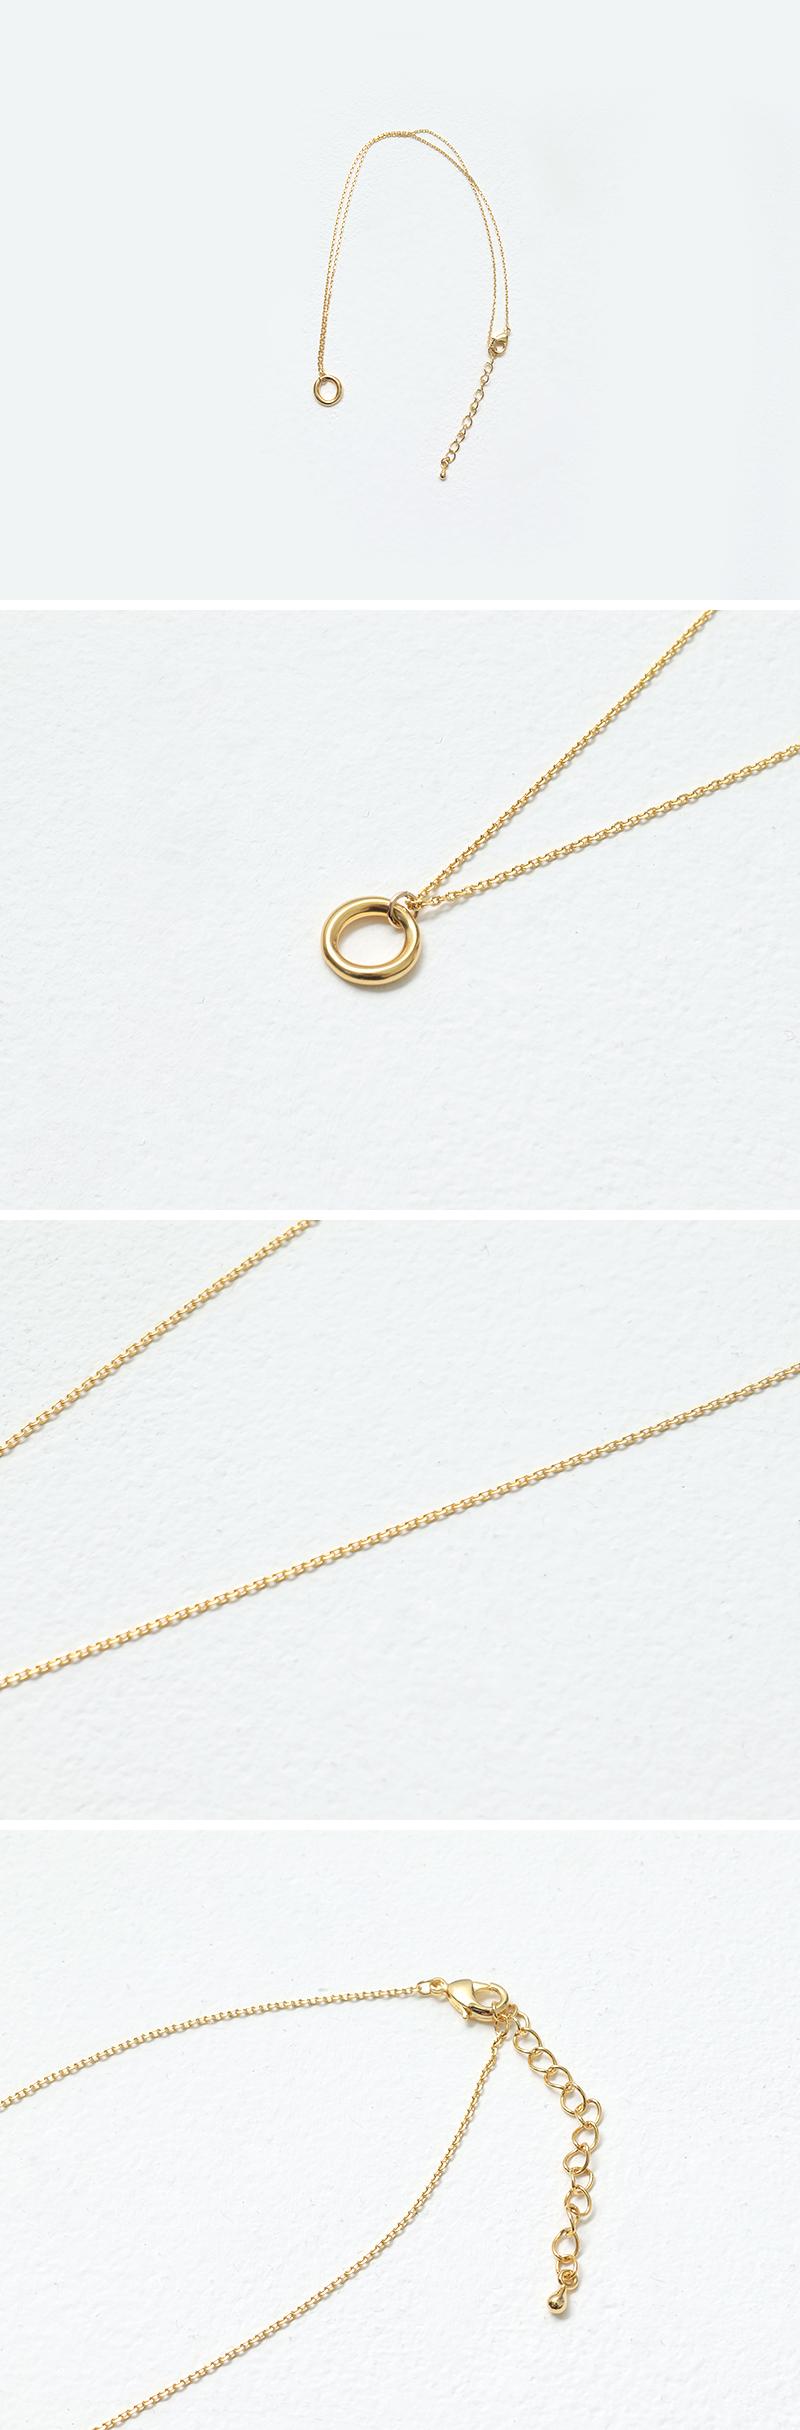 Mini donut pendant necklace